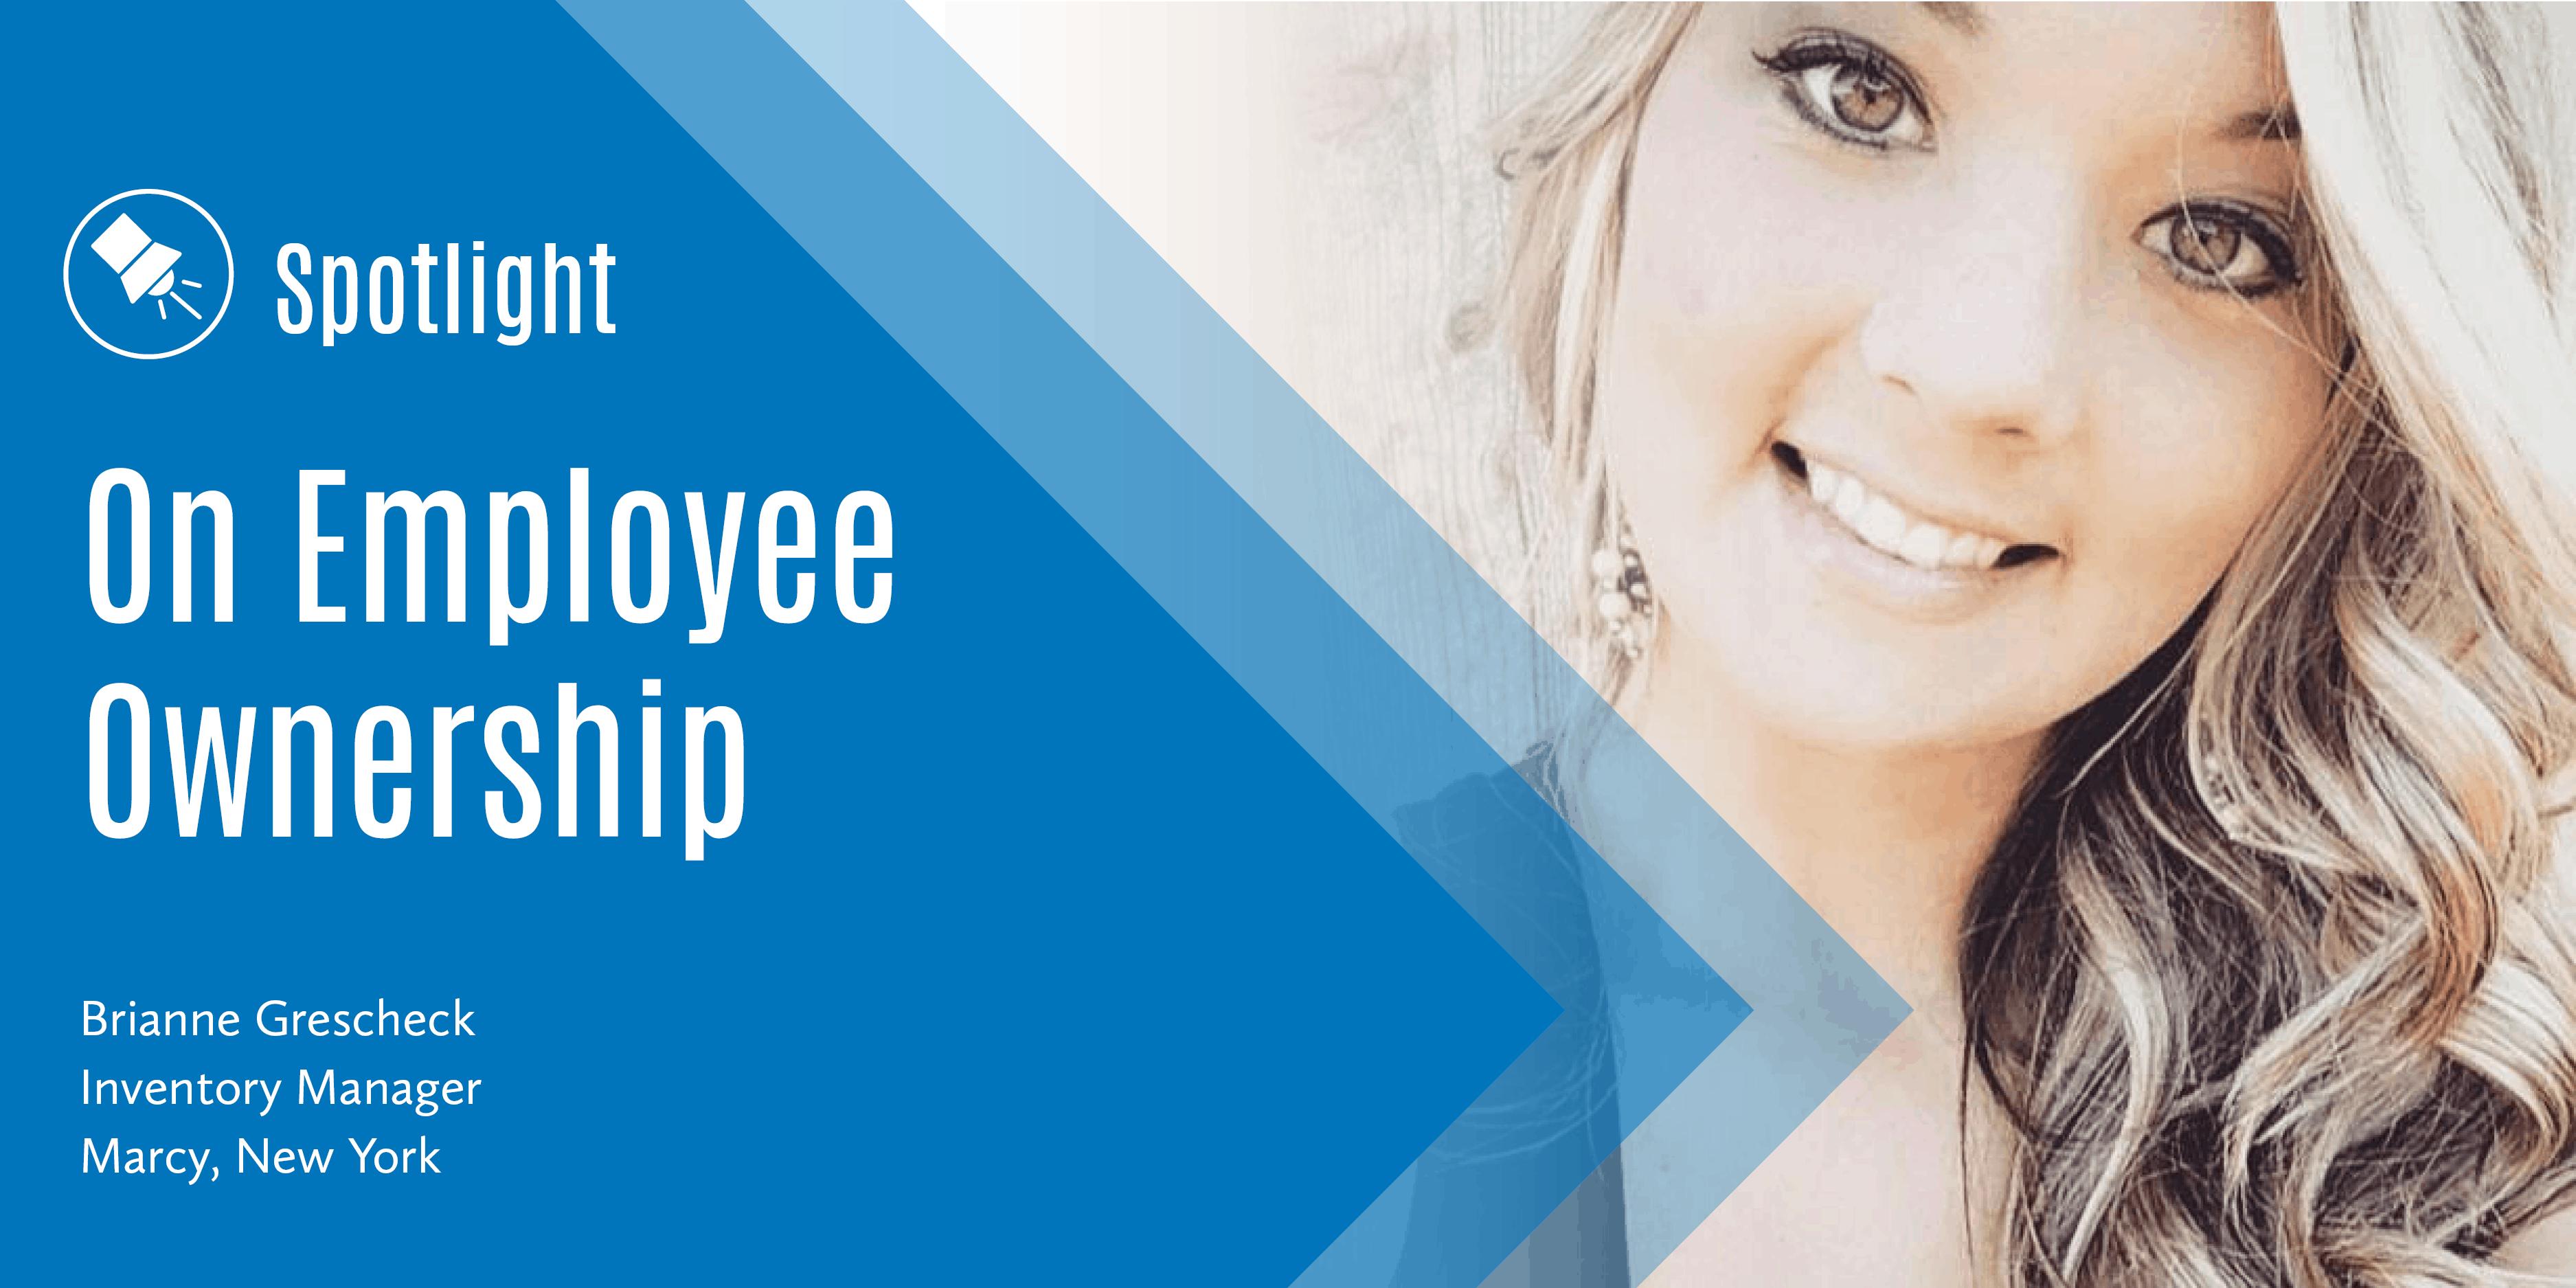 HealthDirect Spotlight on Employee Ownership – Brianne Grescheck